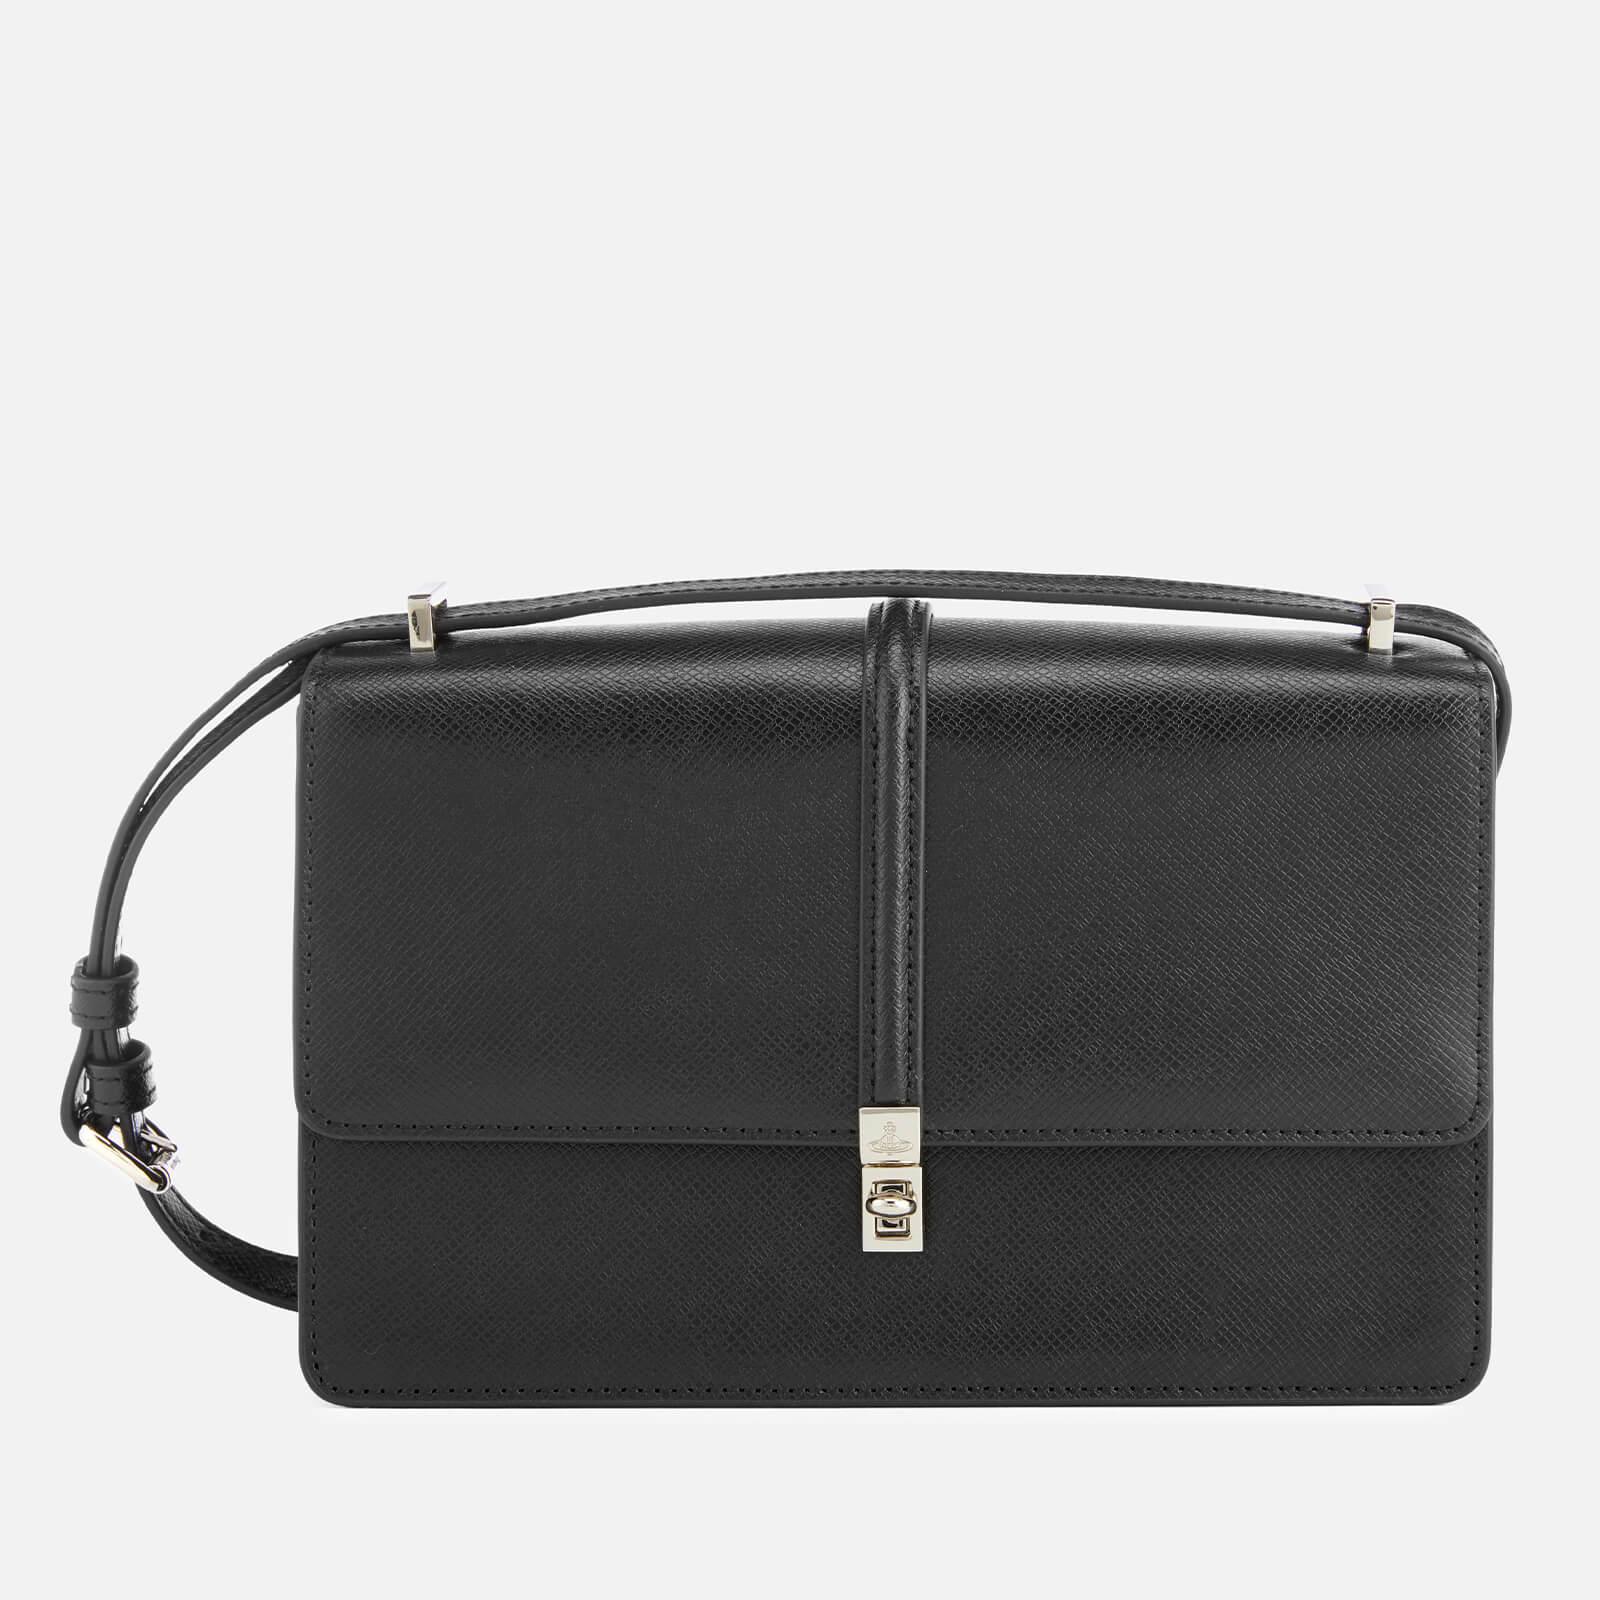 dc491ad56 Vivienne Westwood Women's Sofia Small Cross Body Bag - Black